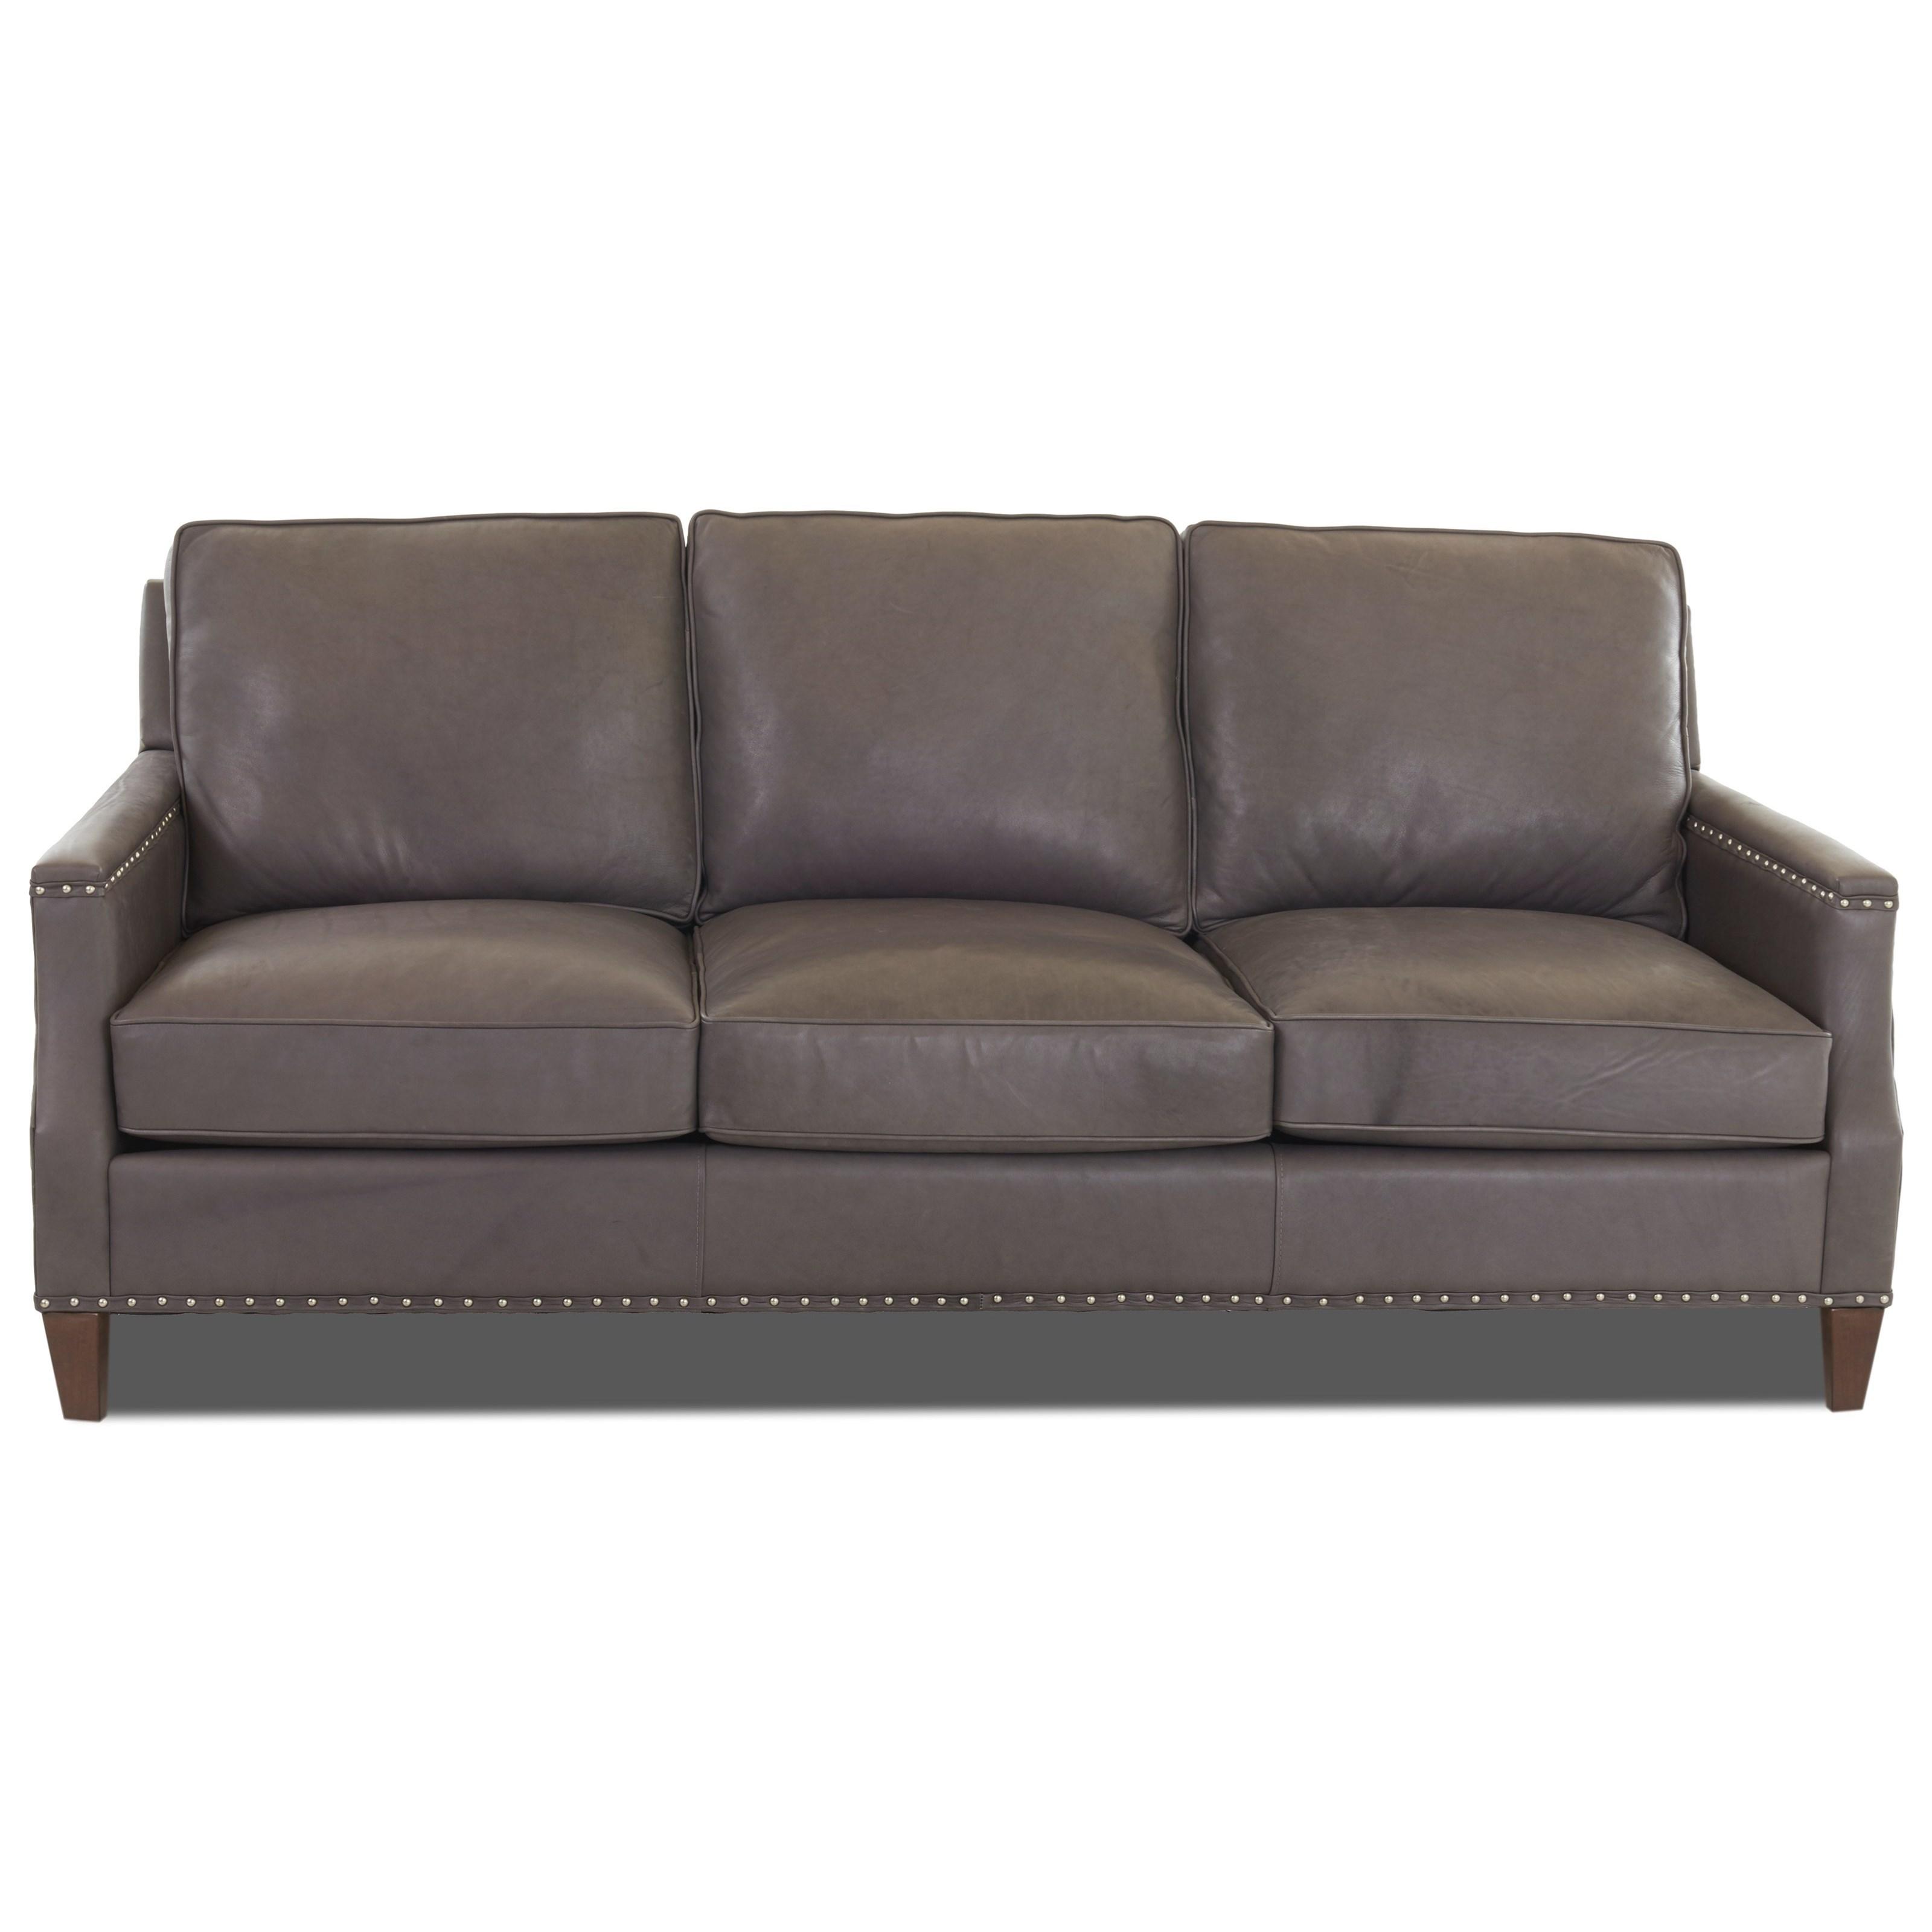 Klaussner Bond Transitional Sofa With Nailhead Studs (No Trim)   Novello  Home Furnishings   Sofas